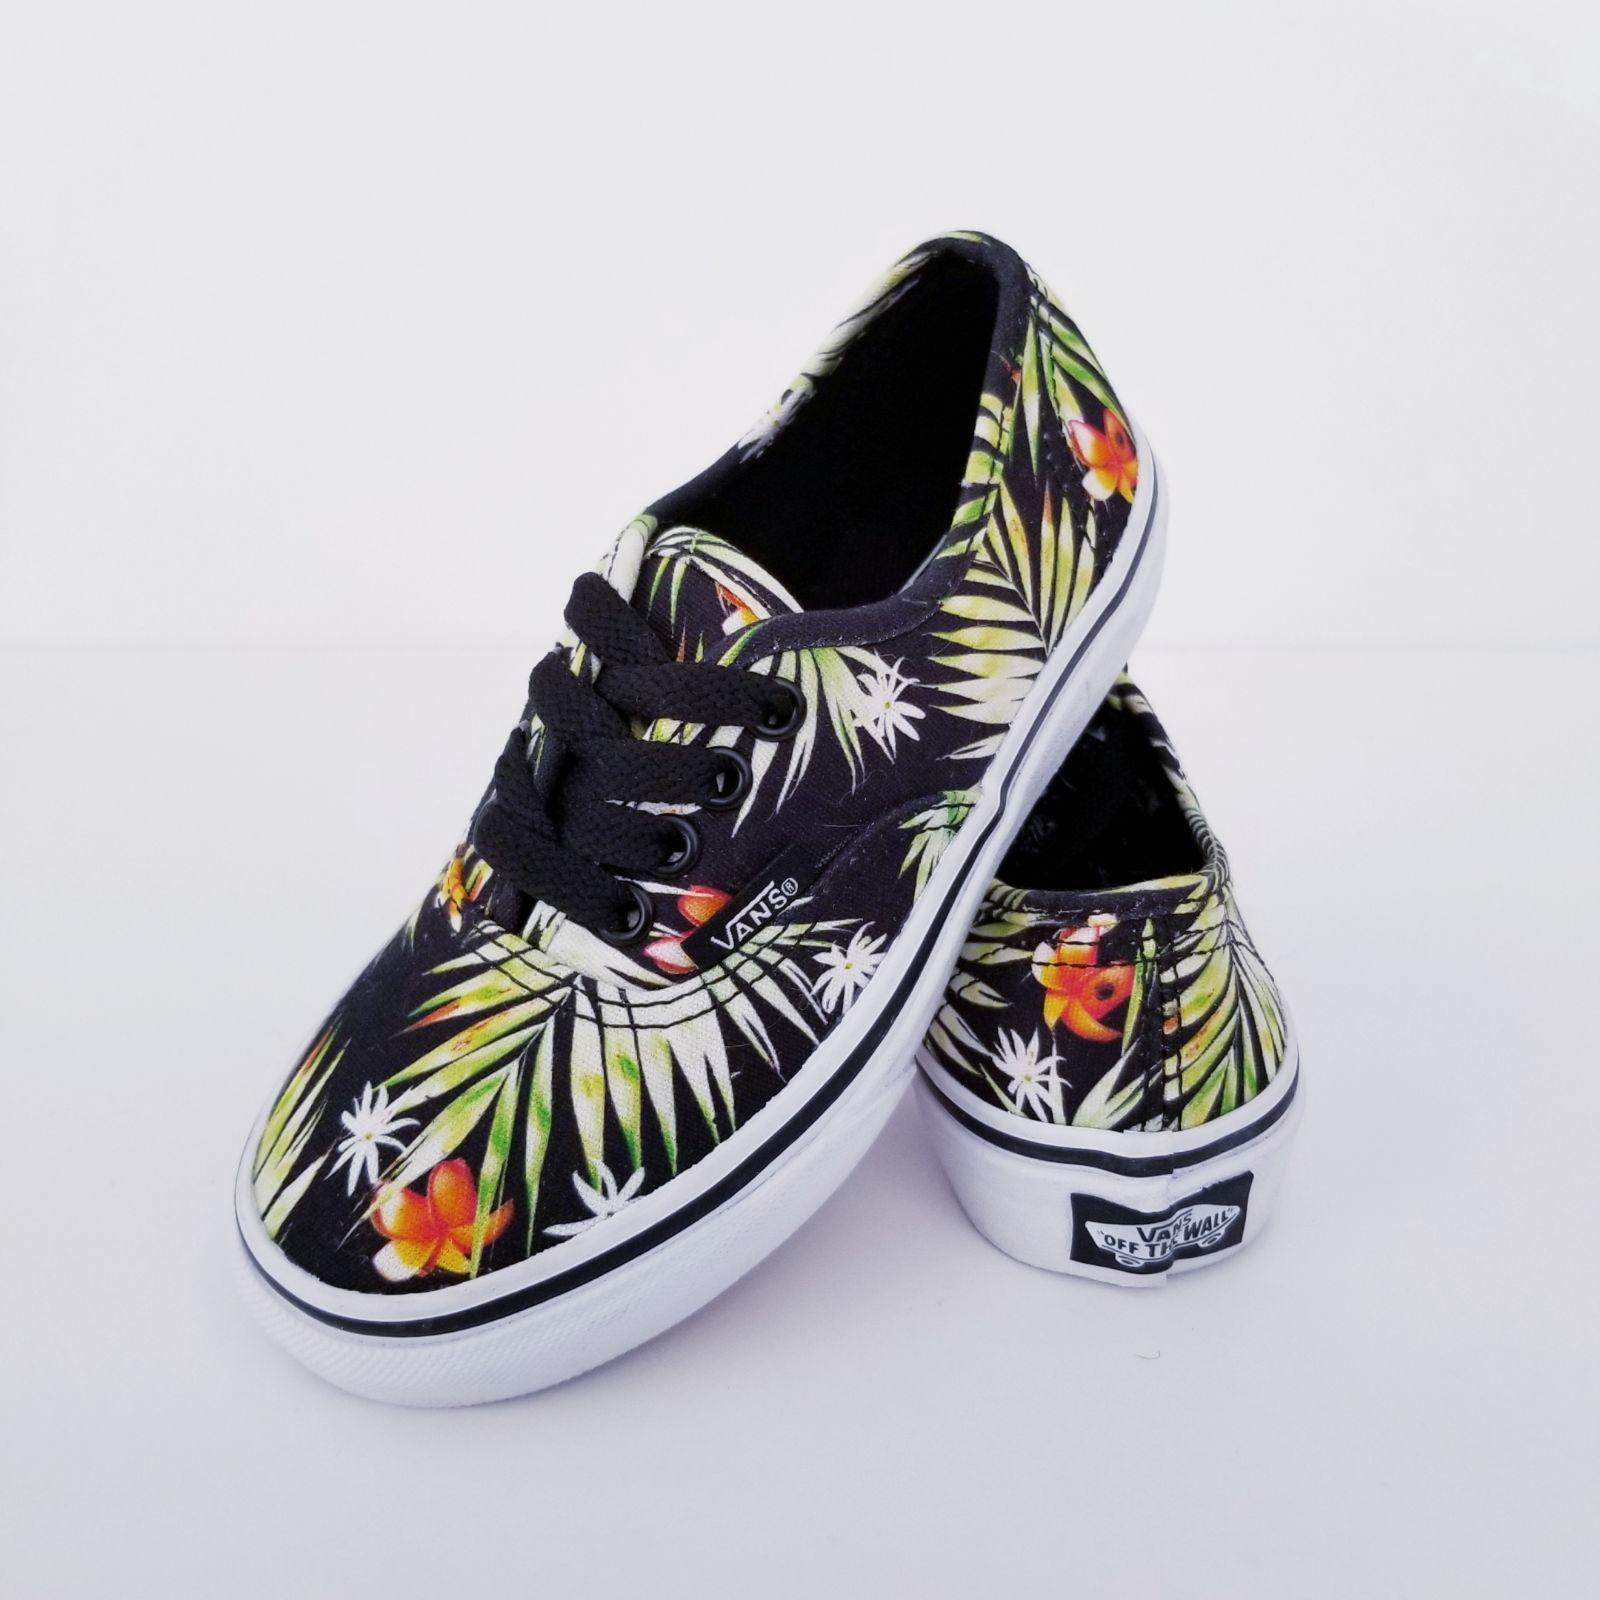 Vans Tropical Print Nice cool kicks for this summer! Boys ...